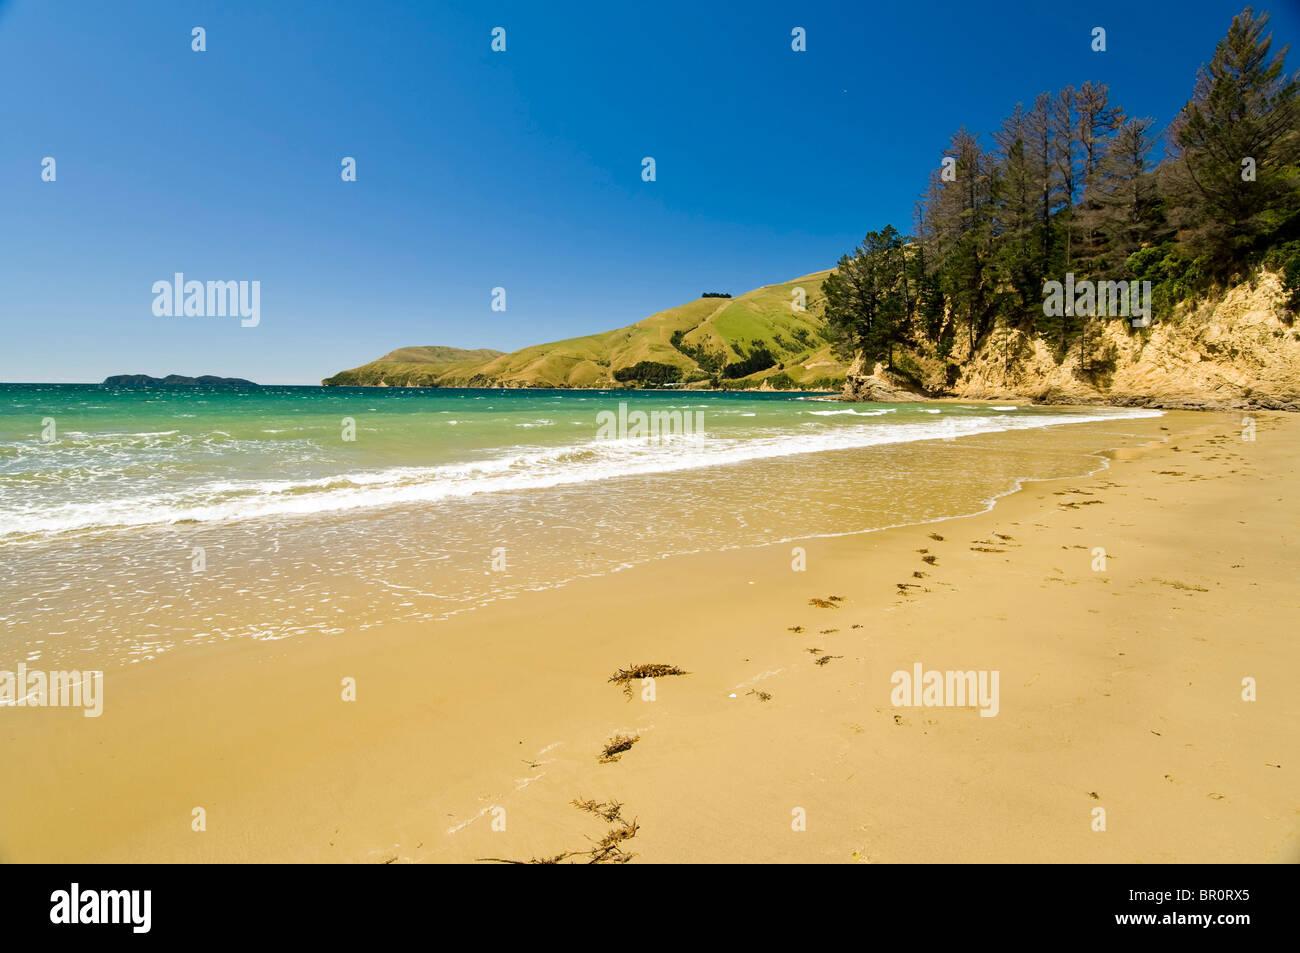 New Zealand, South Island, Marlborough Sounds. Beach at ...